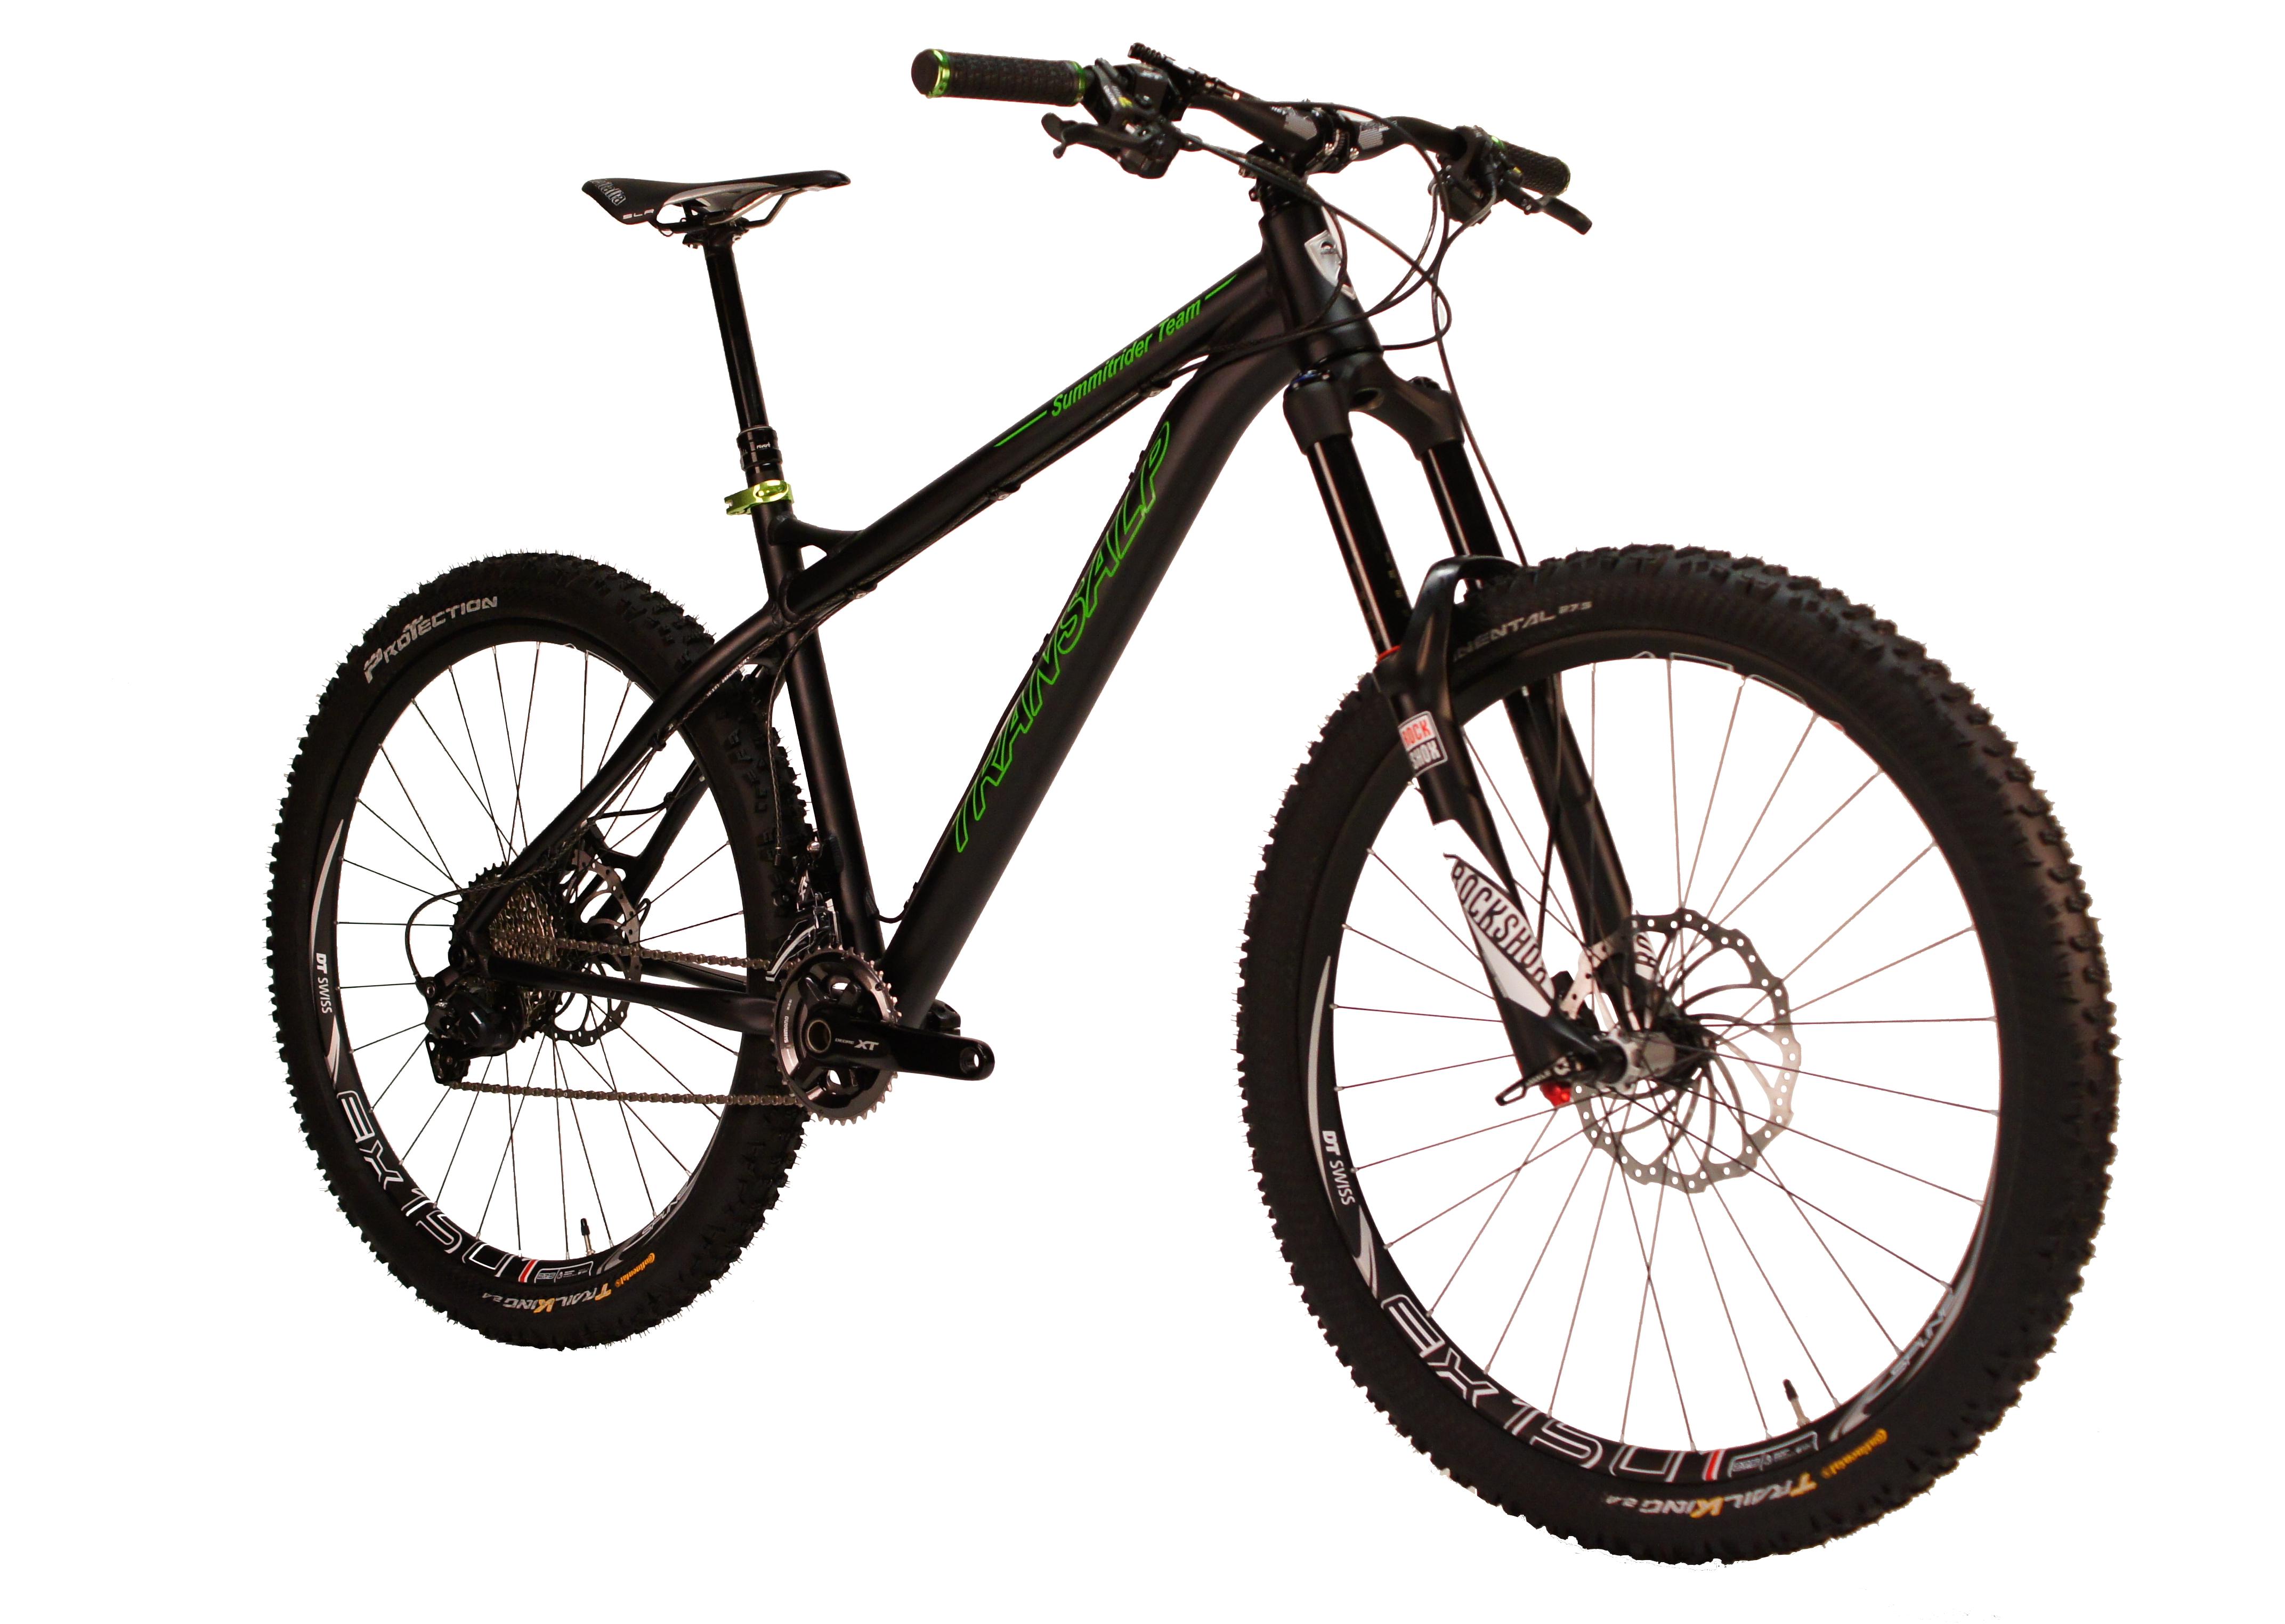 hardtail mountainbike transalp bikes transalp bikes. Black Bedroom Furniture Sets. Home Design Ideas